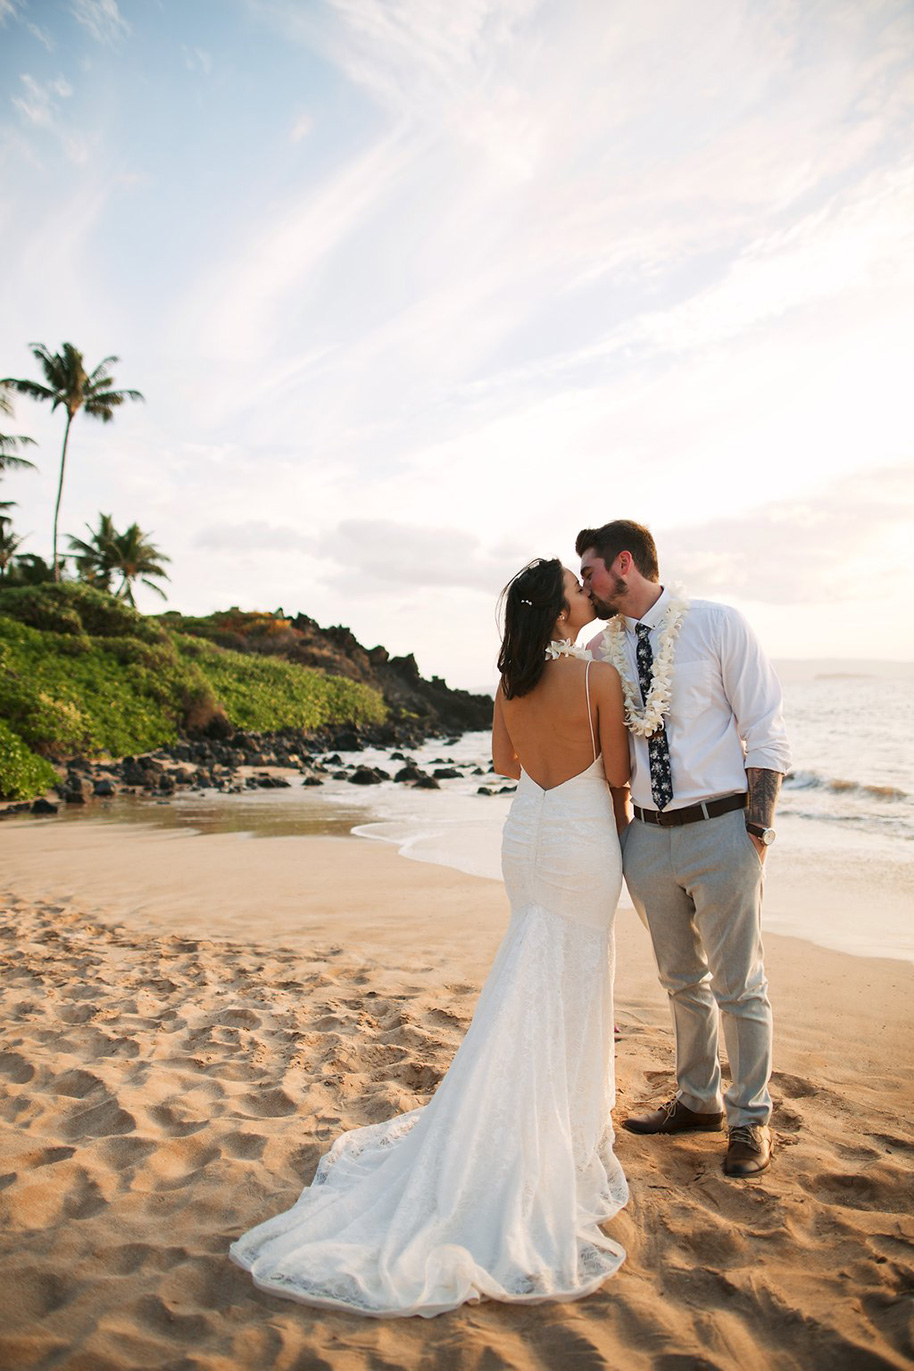 Maui-Beach-Wedding-070616-18